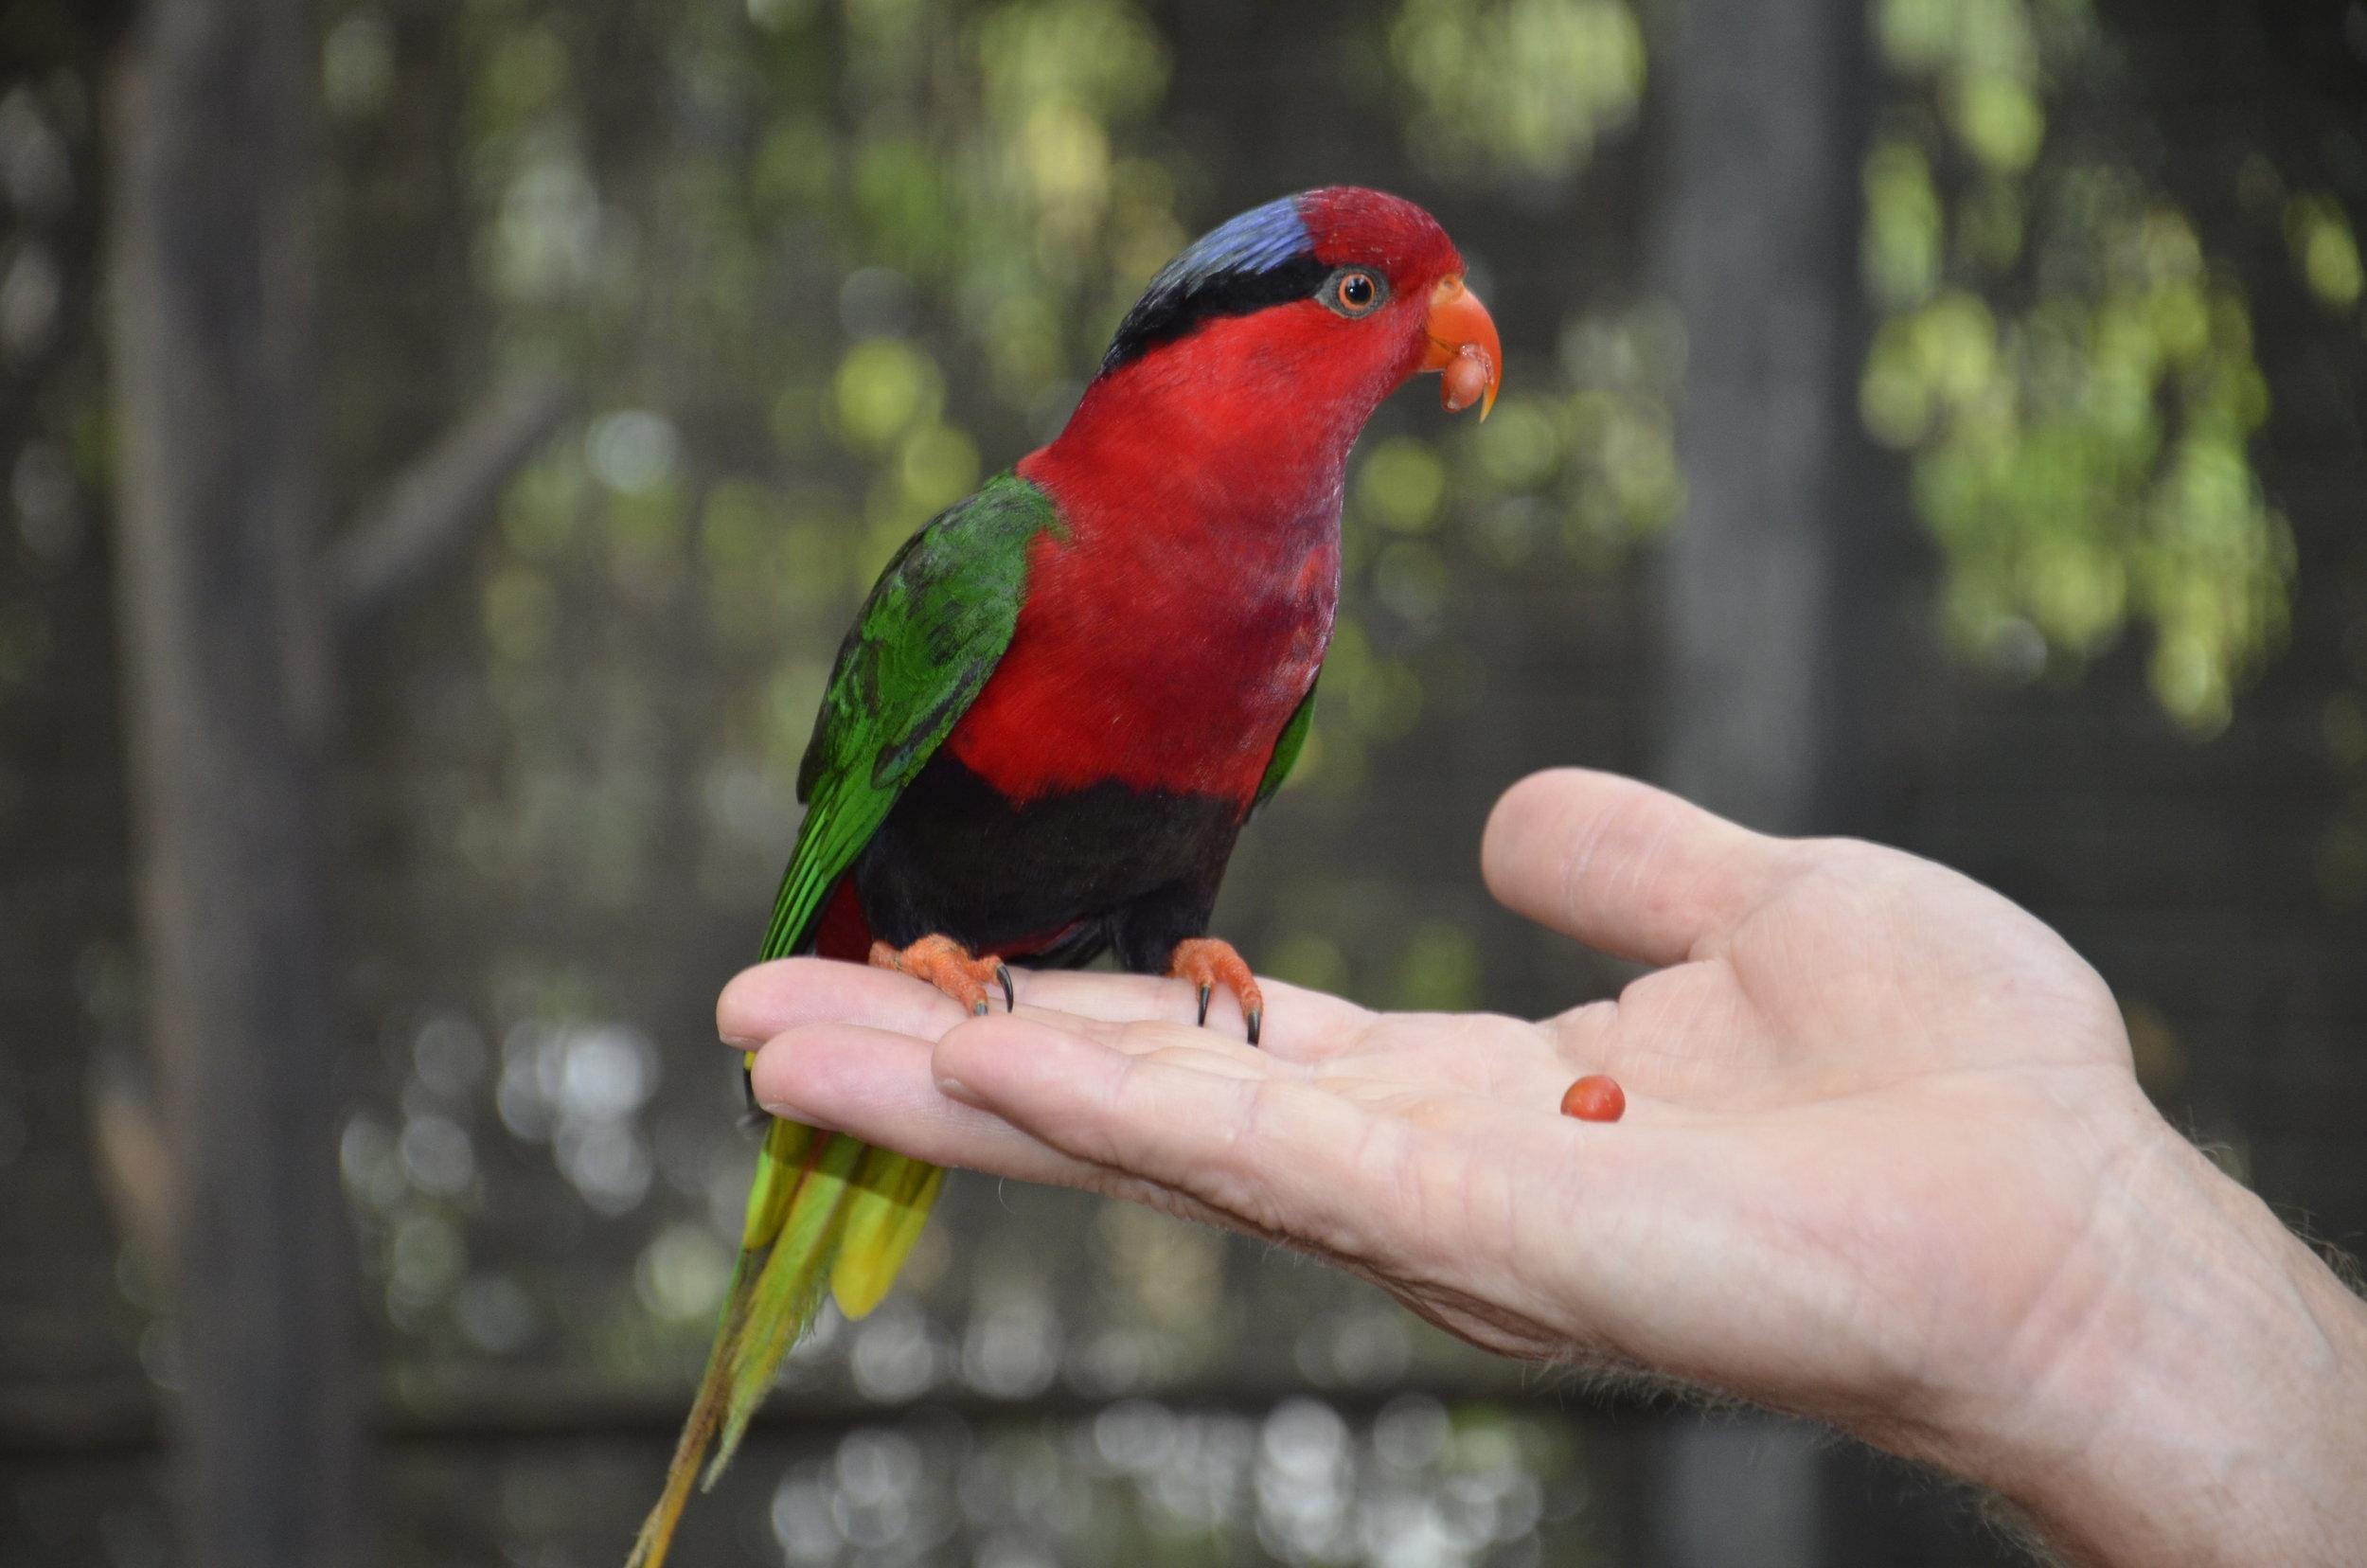 A Papuan Lorakeet on Steve's hand